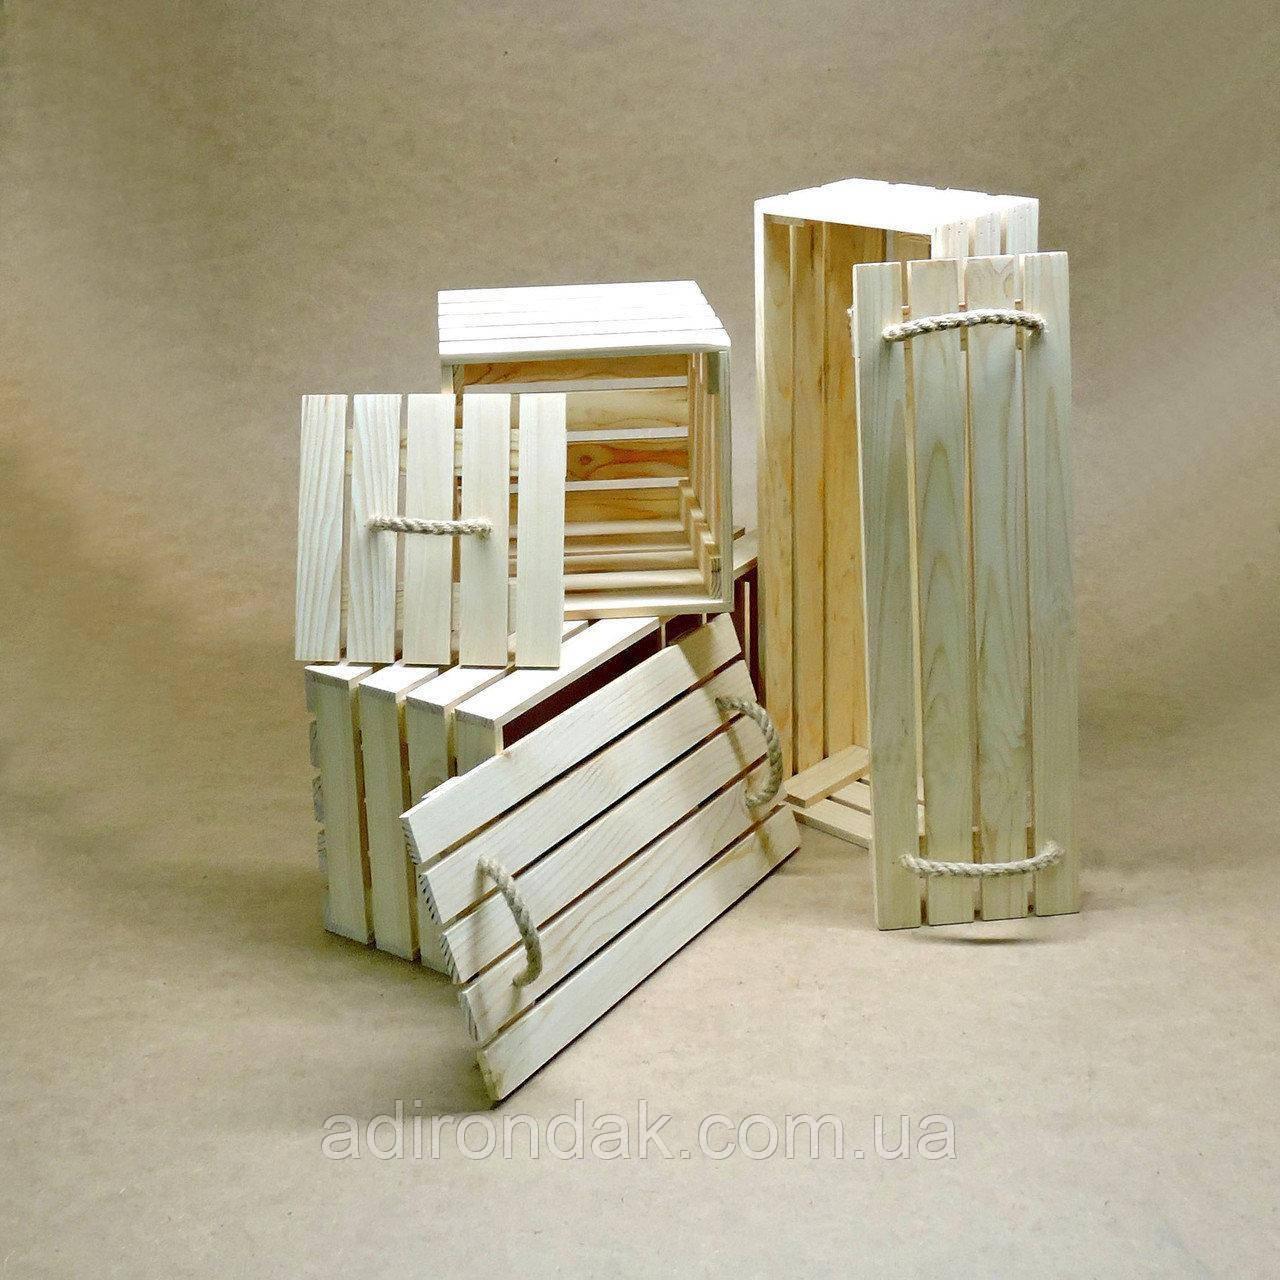 Ящик для хранения Маями В20хД40хШ40см, фото 1